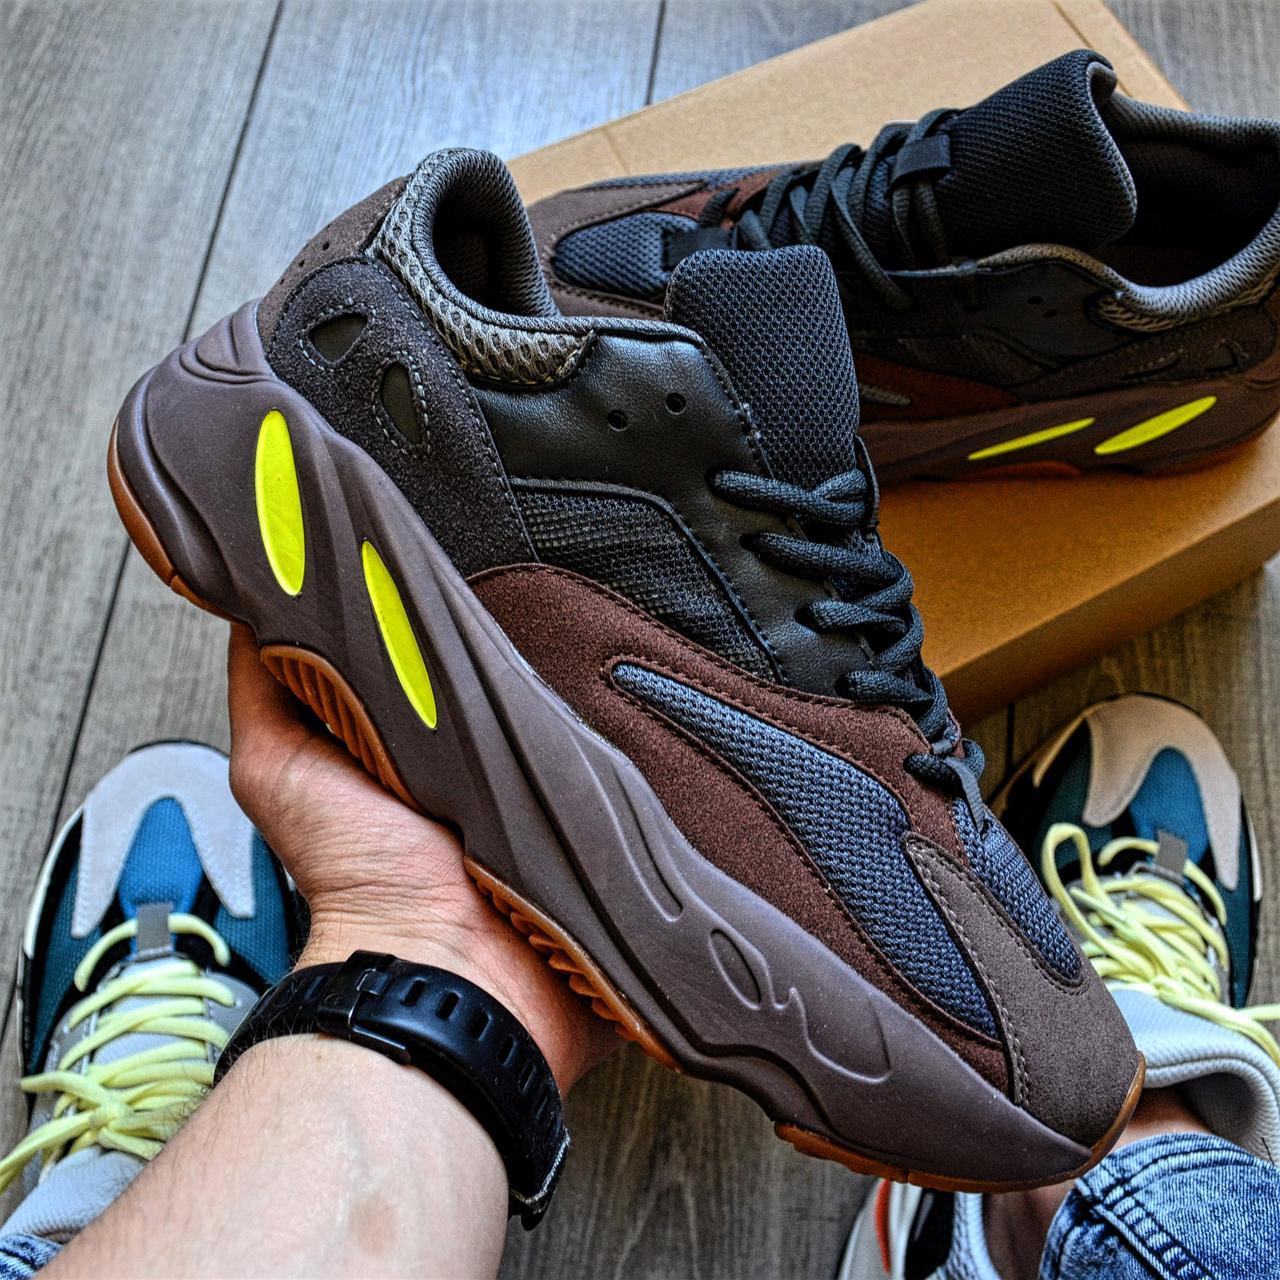 6573b9a2 Мужские кроссовки Adidas Yeezy Boost 700 Mauve (Реплика ААА+) -  Интернет-магазин